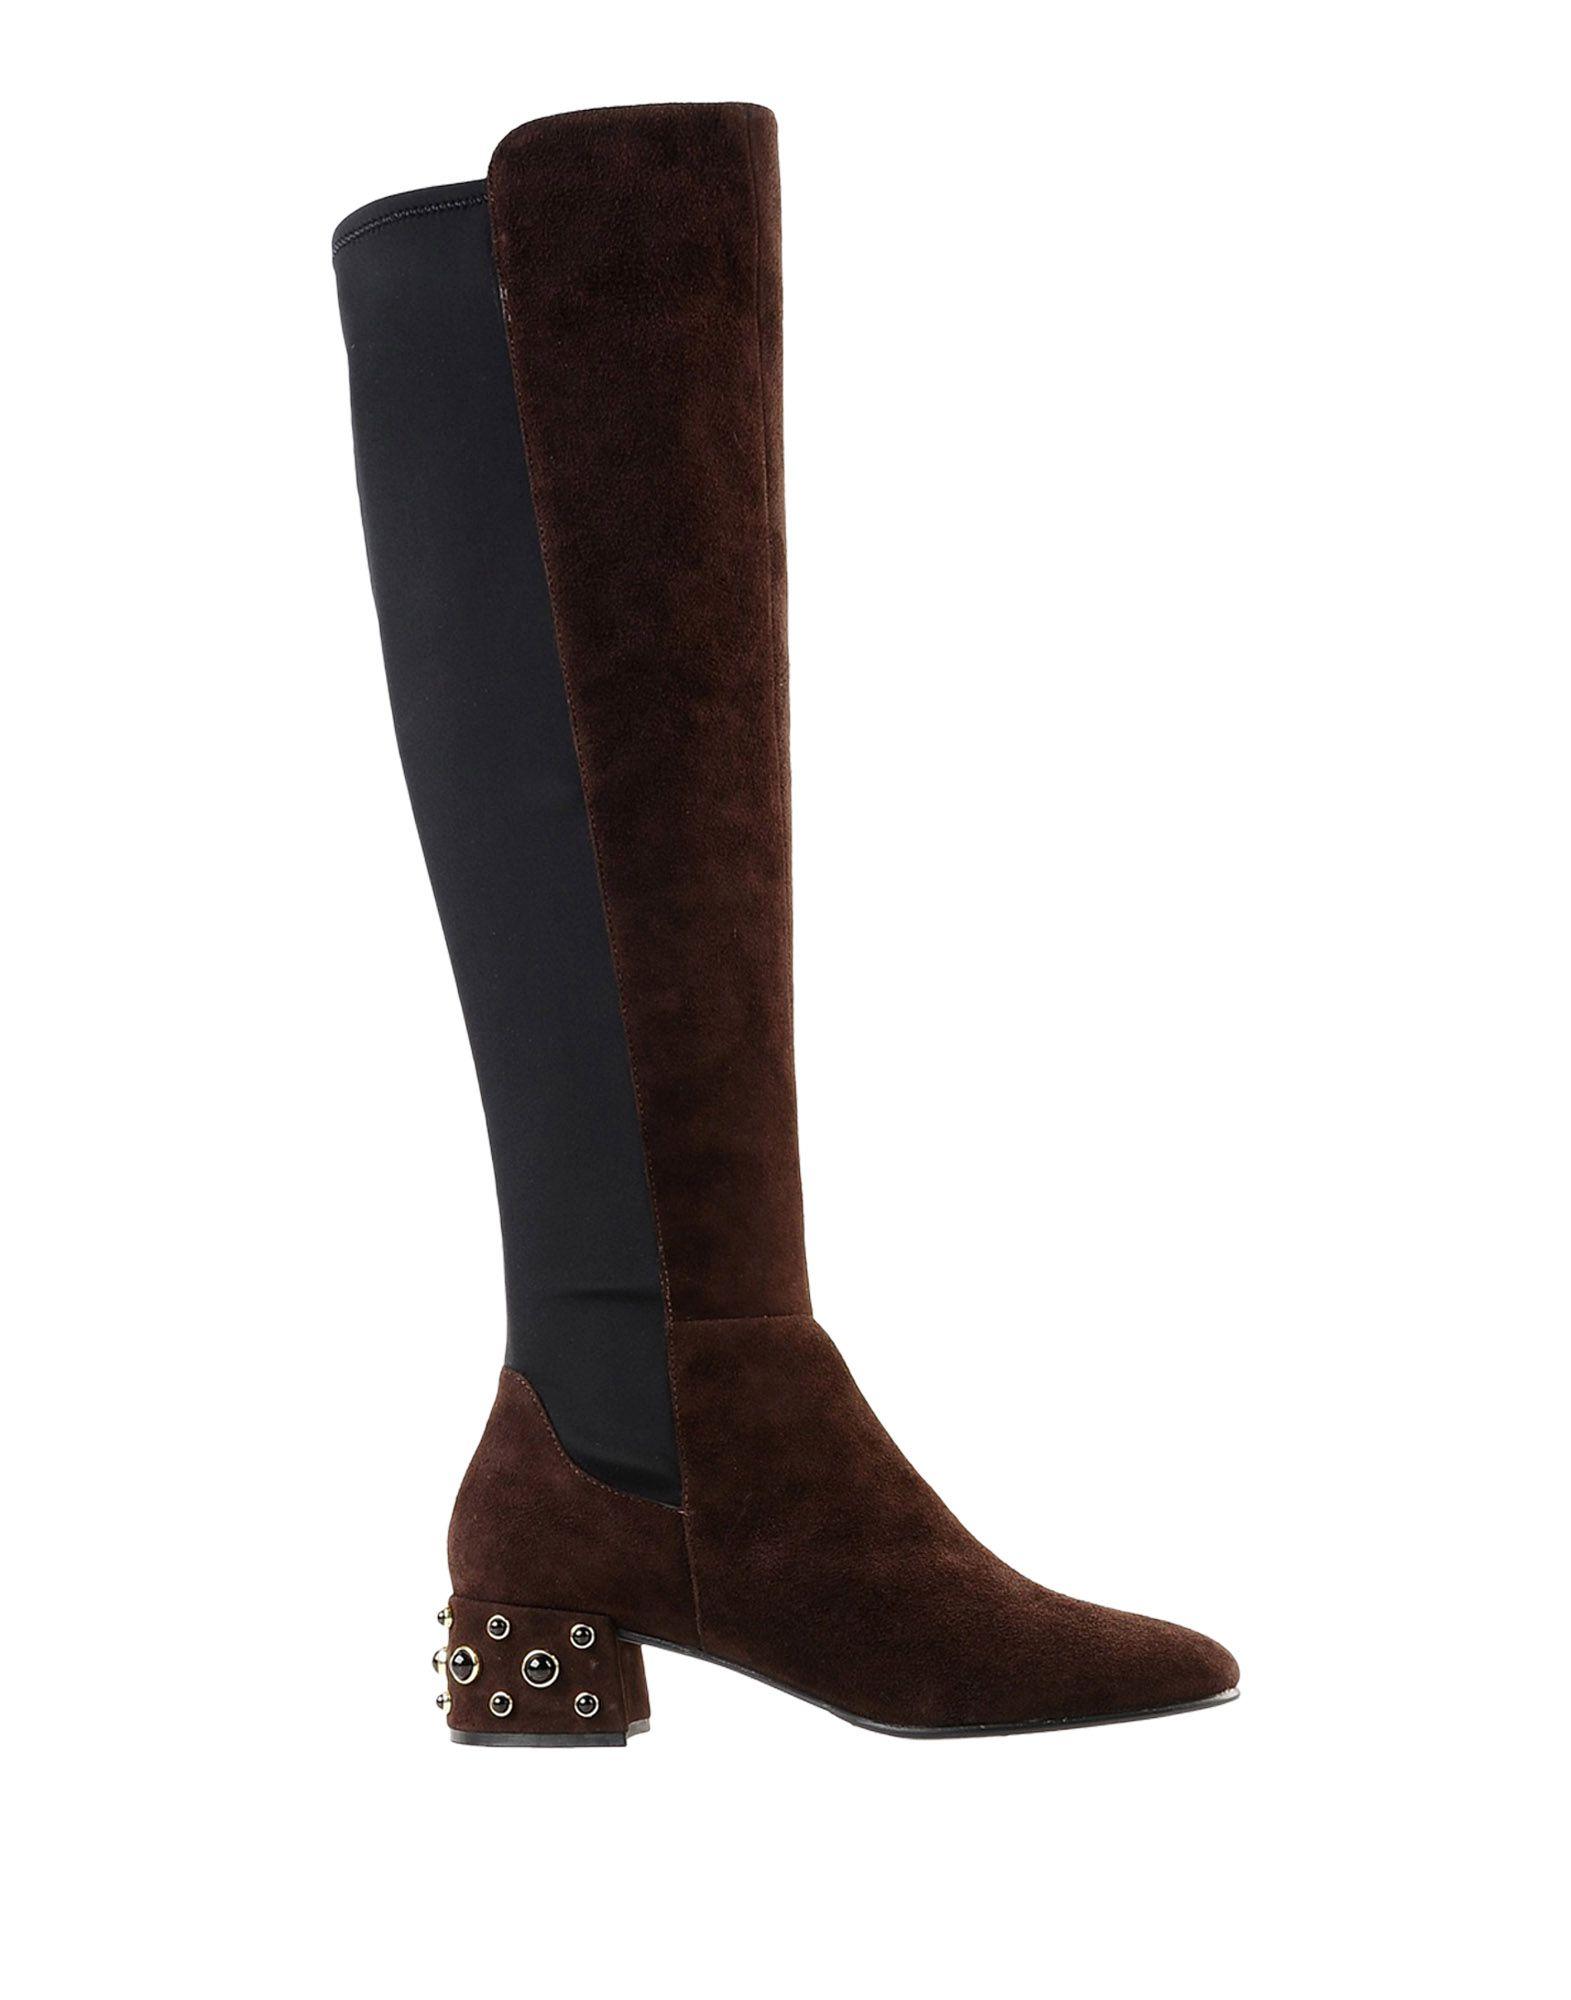 Bruno Premi Stiefel Damen  11538645MUGut aussehende strapazierfähige Schuhe